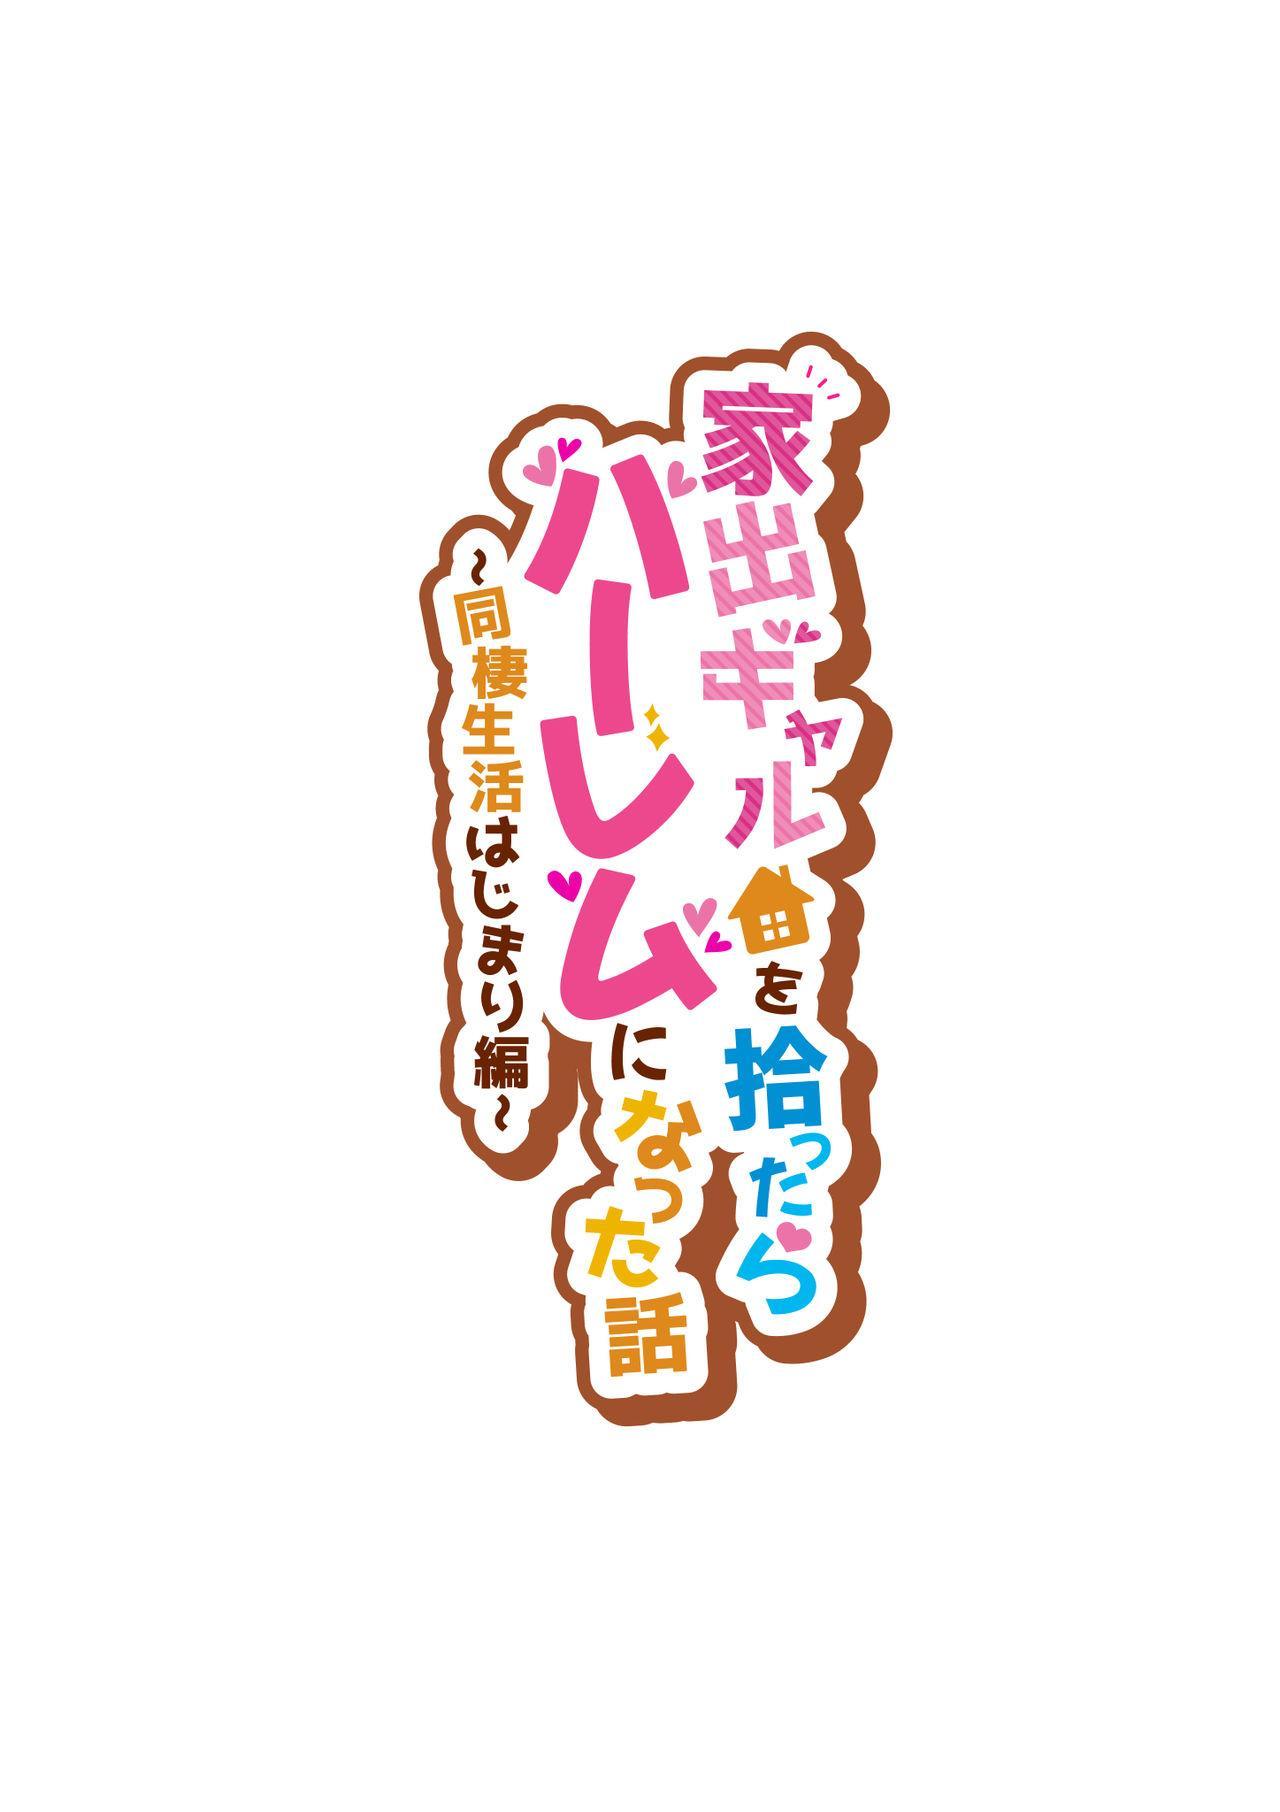 Iede Gal o Hirottara Harem ni Natta Hanashi 1